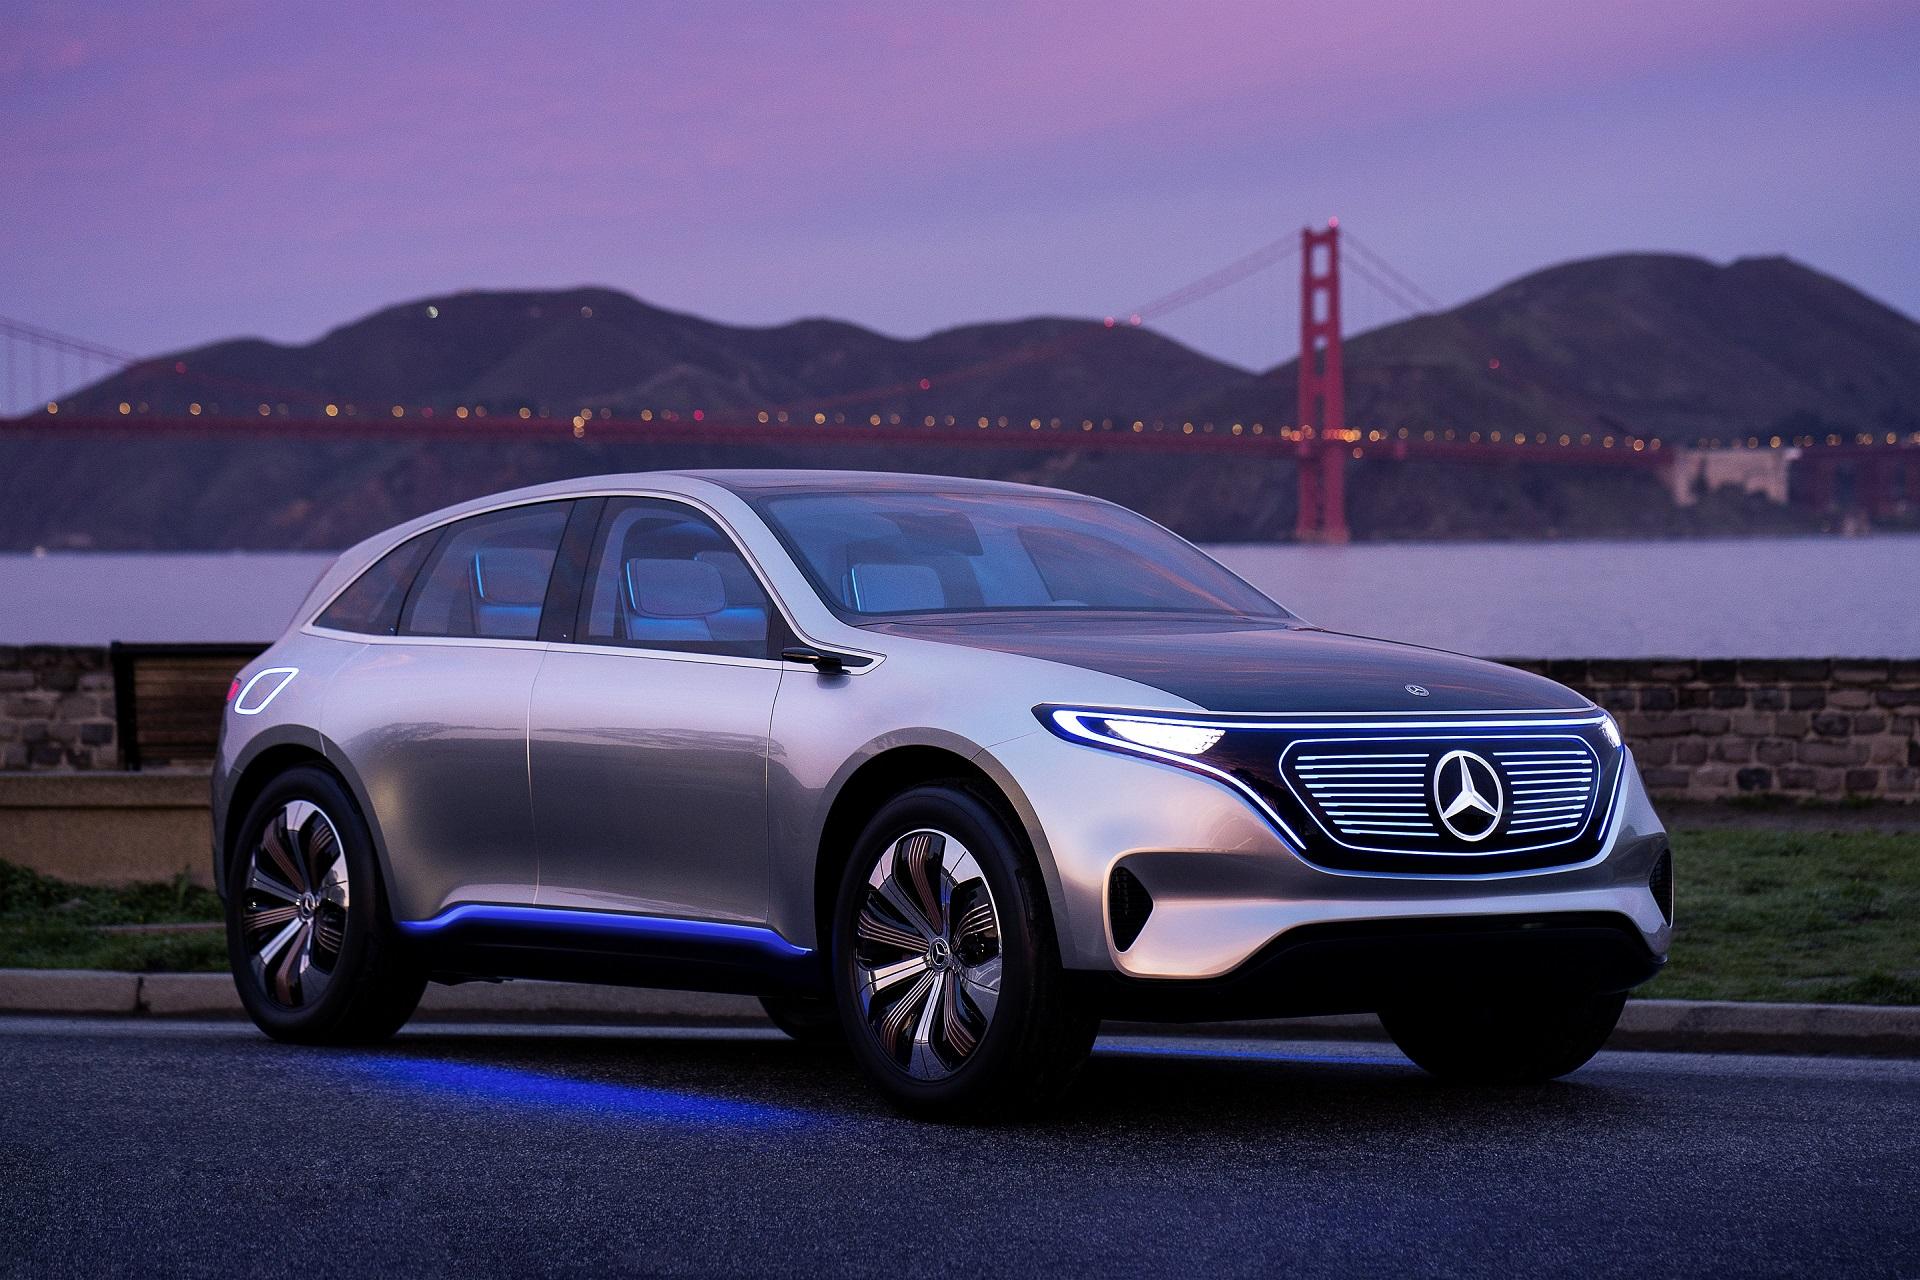 Future Car Wallpaper Hd For Desktop Mercedes Benz Electric Cars To Arrive Sooner As Urgency